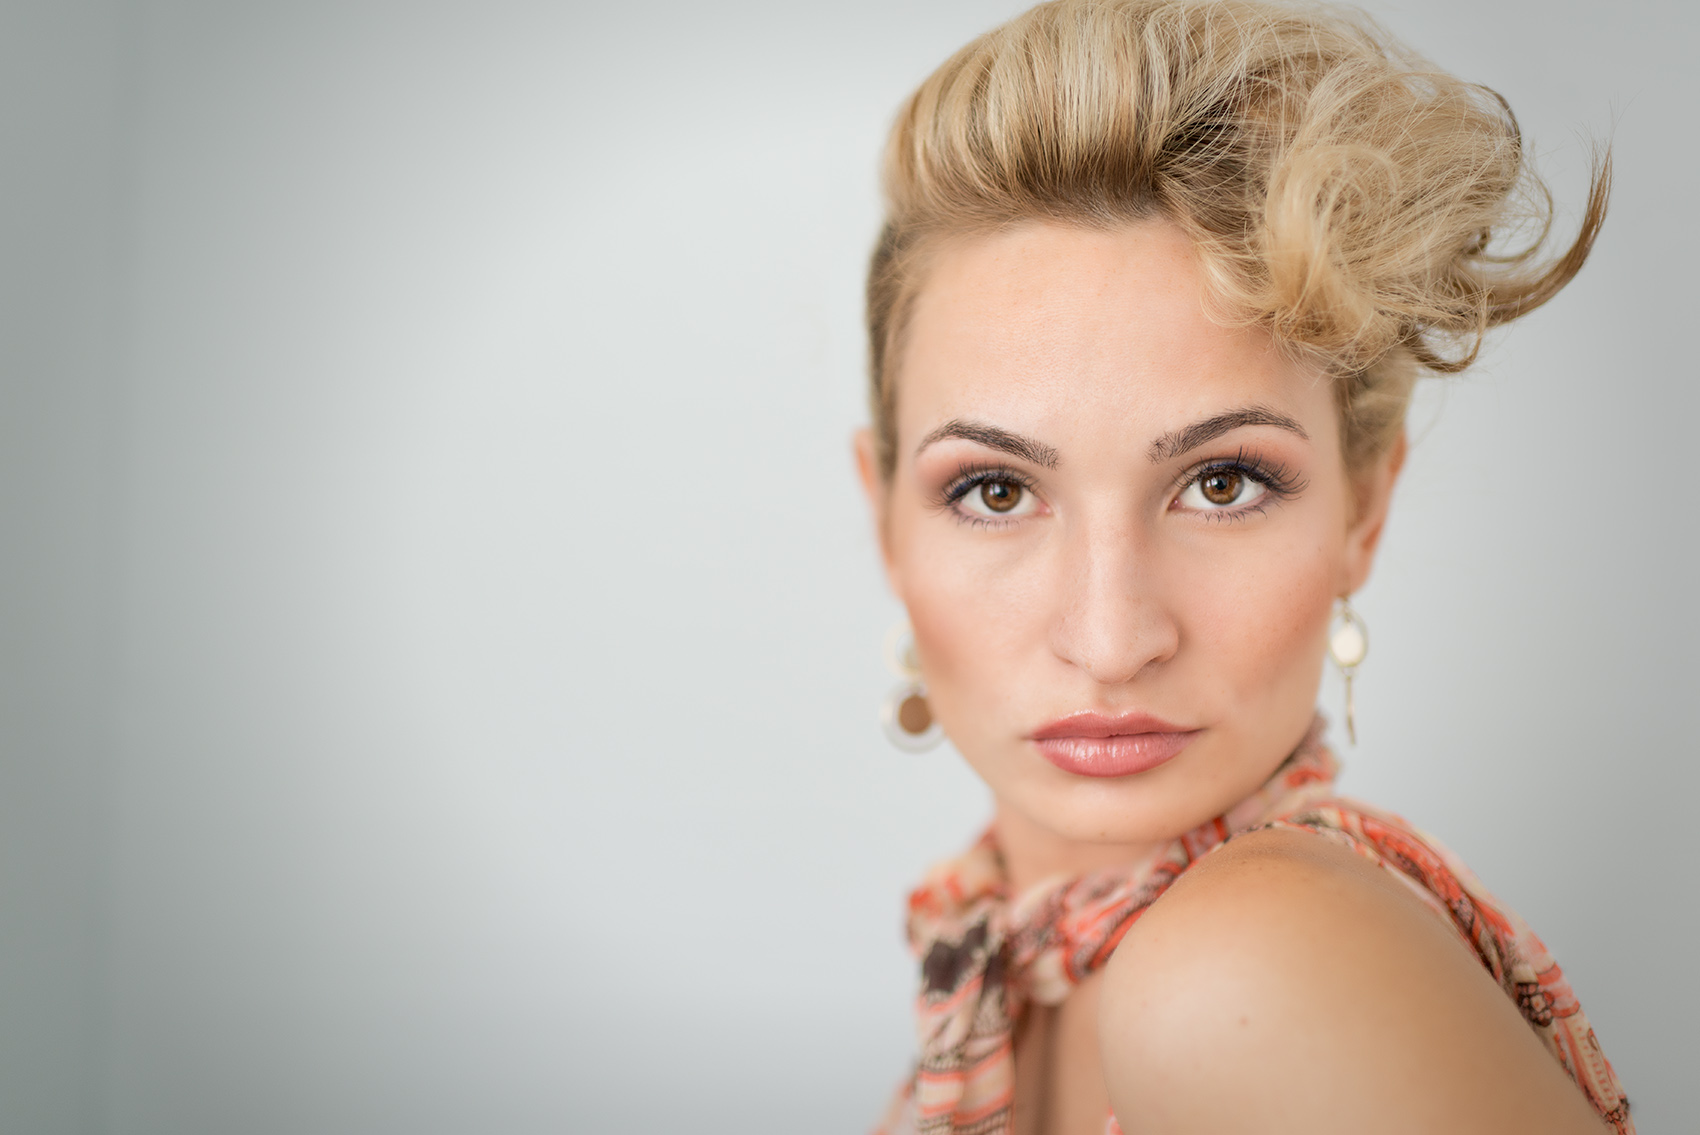 sensual headshot of a model.